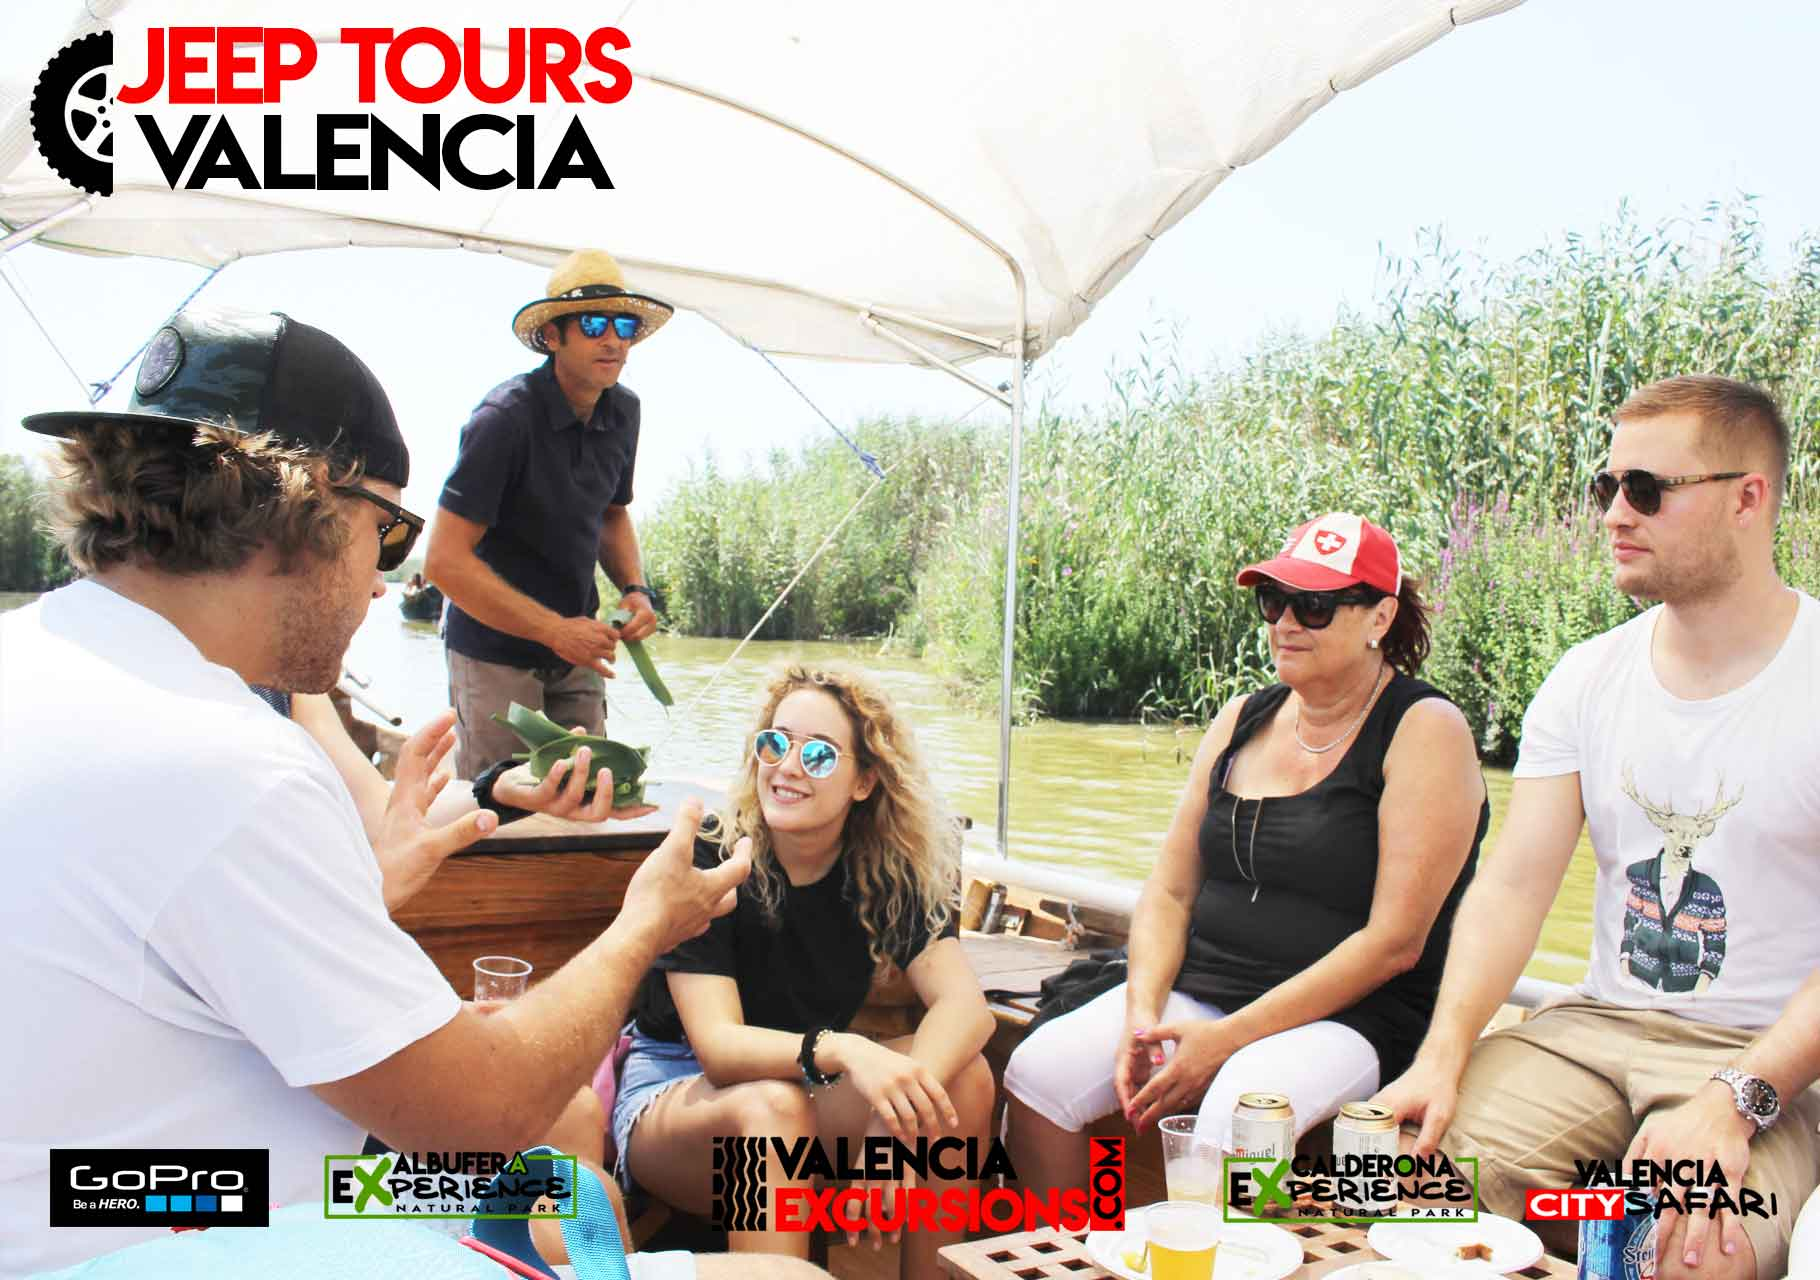 "Tapas in ""El Palmar"" mit Boot Ausflug im Albufera National Park. Mit Albufera EXperience auf Jeep Tour in Valencia"